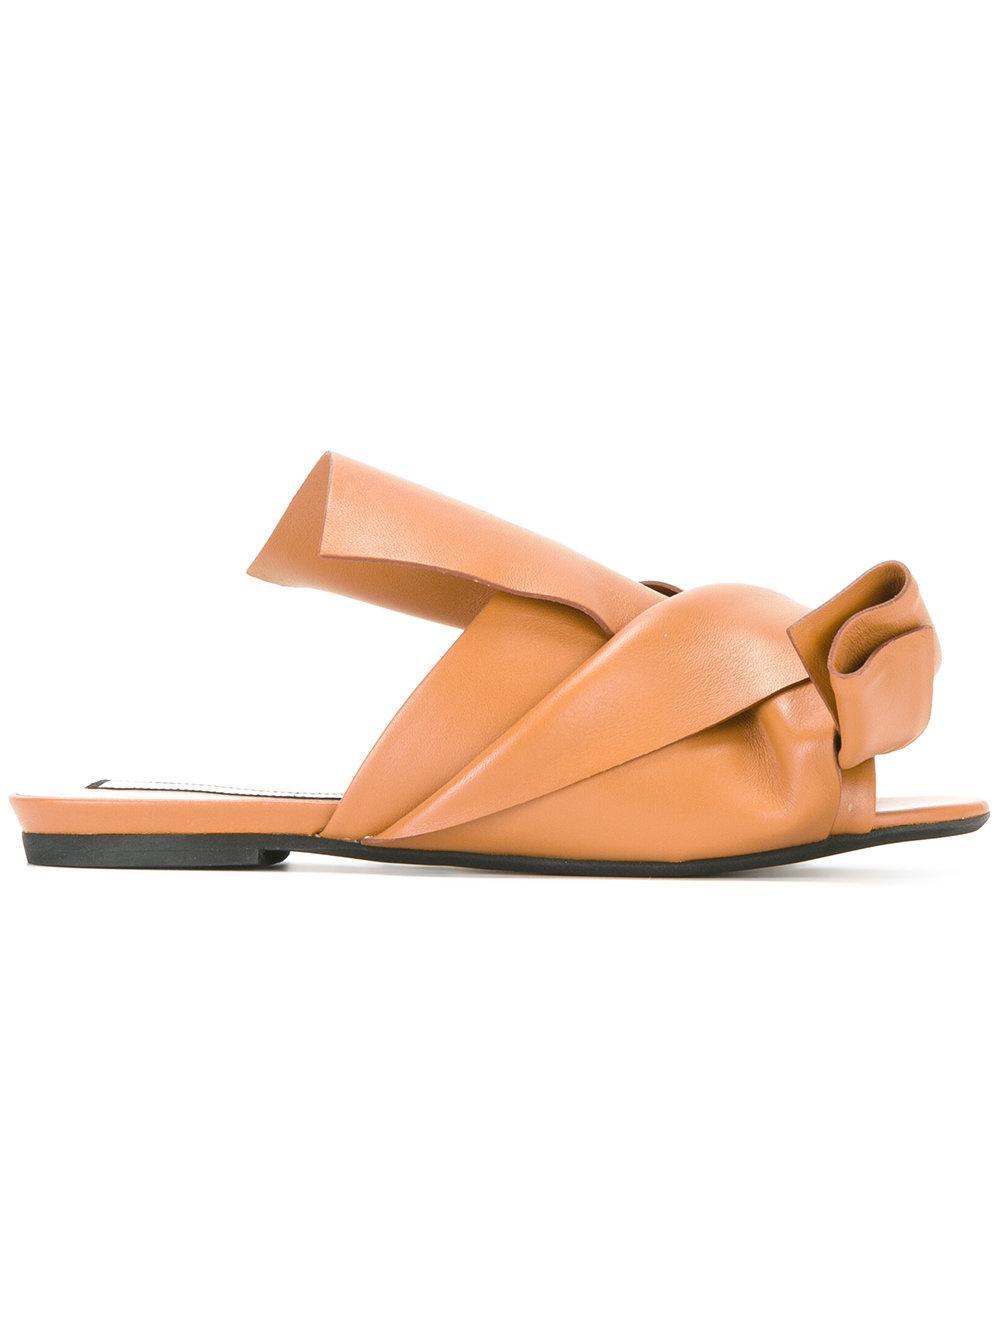 Where Can I Order logo plaque flat sandals - Brown N Finishline Cheap Online For Cheap Online Cheap Sale 2018 Unisex 3xgwQbHn